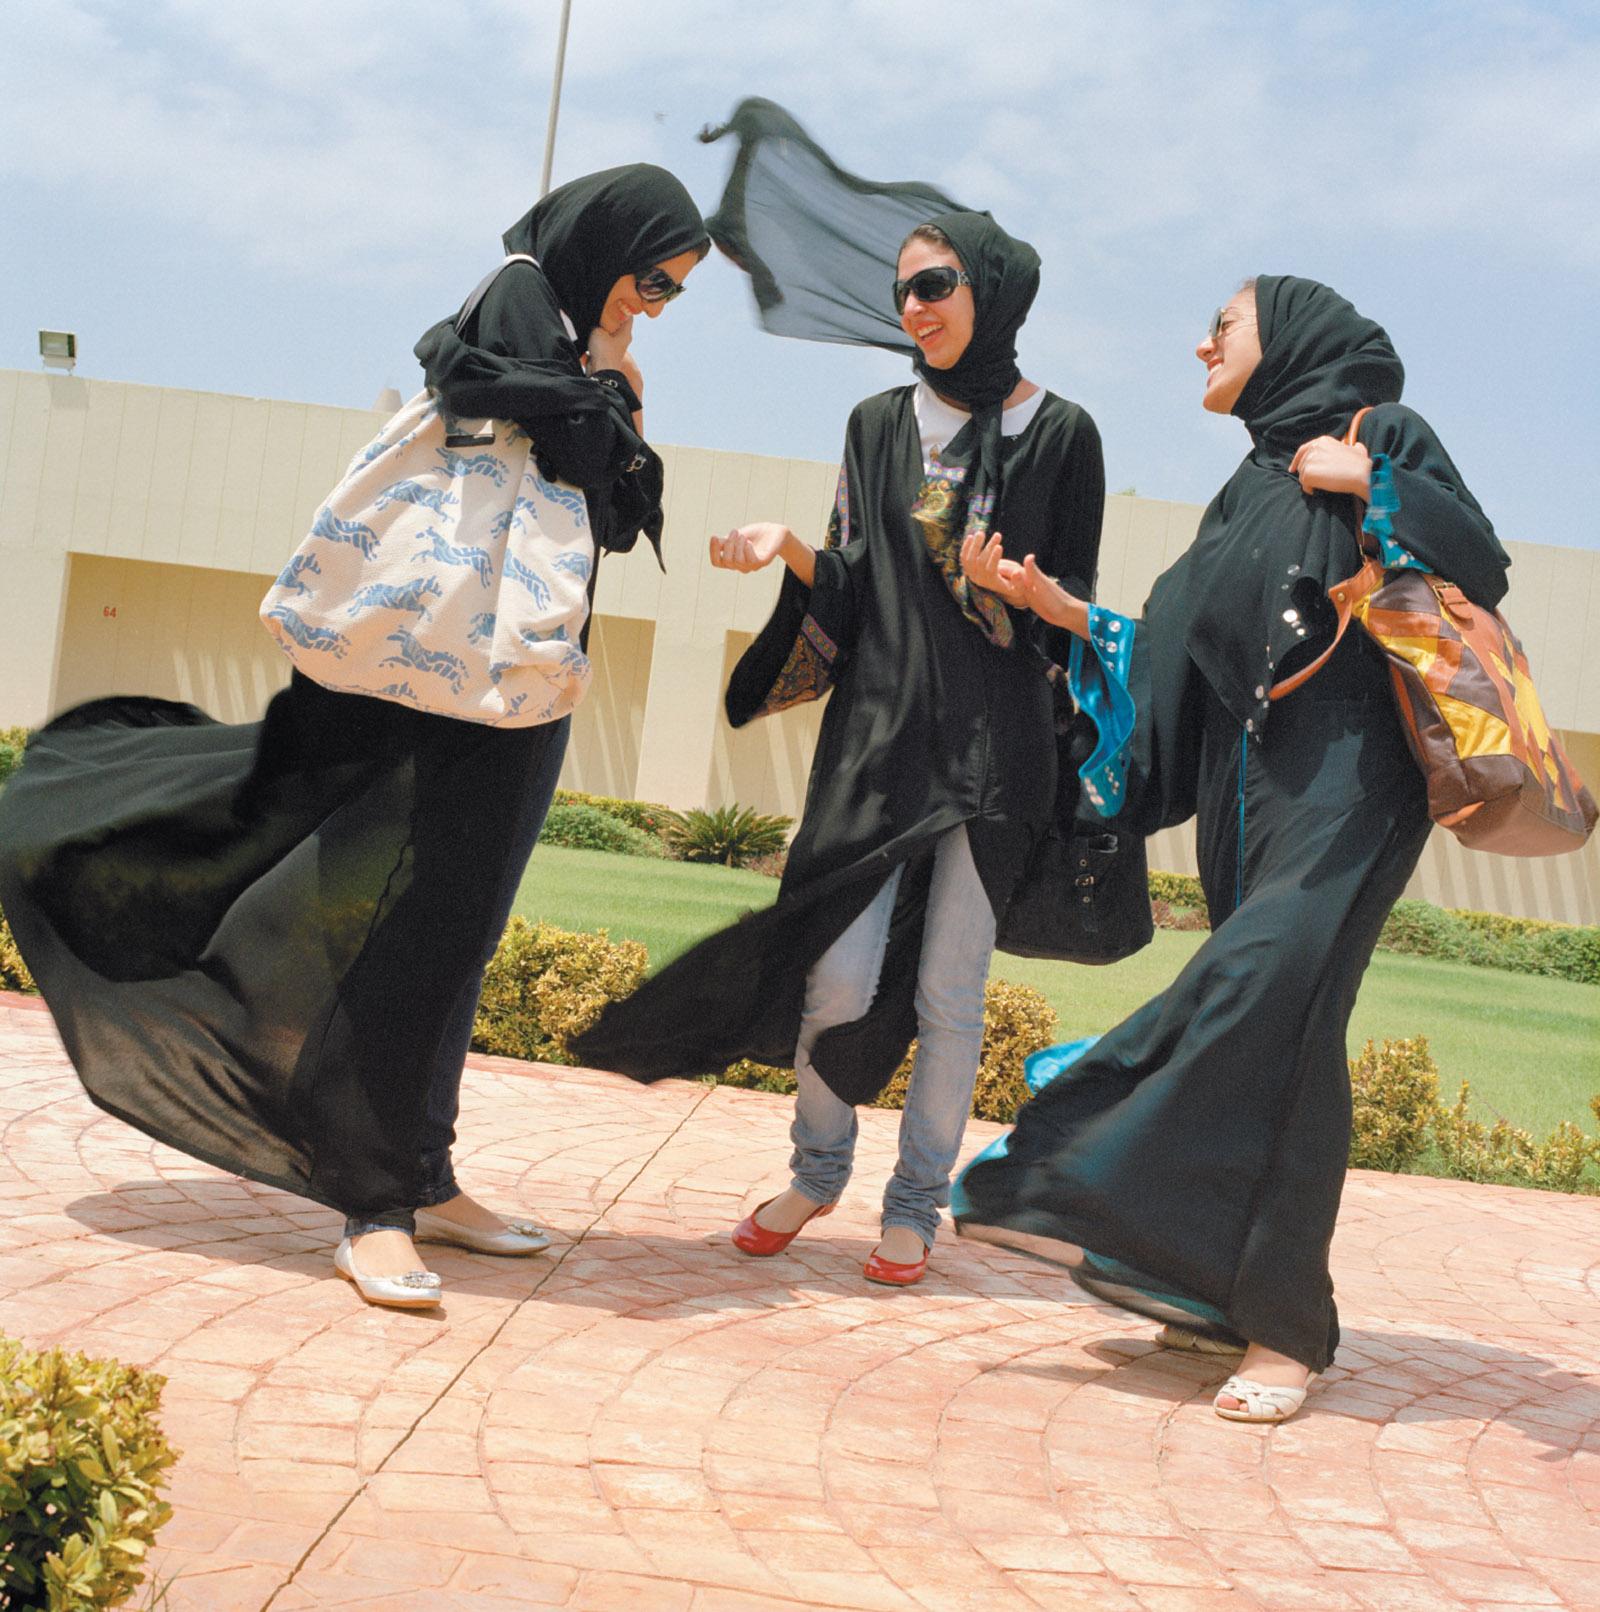 Students at Effat Women's University, Jeddah, Saudi Arabia, 2009; photograph by Olivia Arthur from her 2012 book, Jeddah Diary